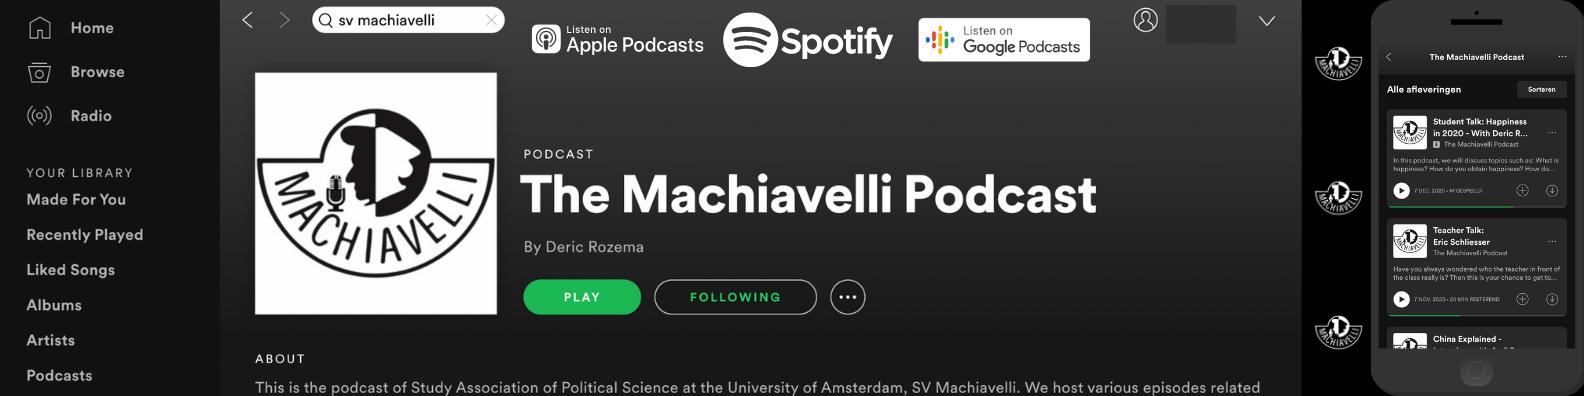 The Machiavelli Podcast